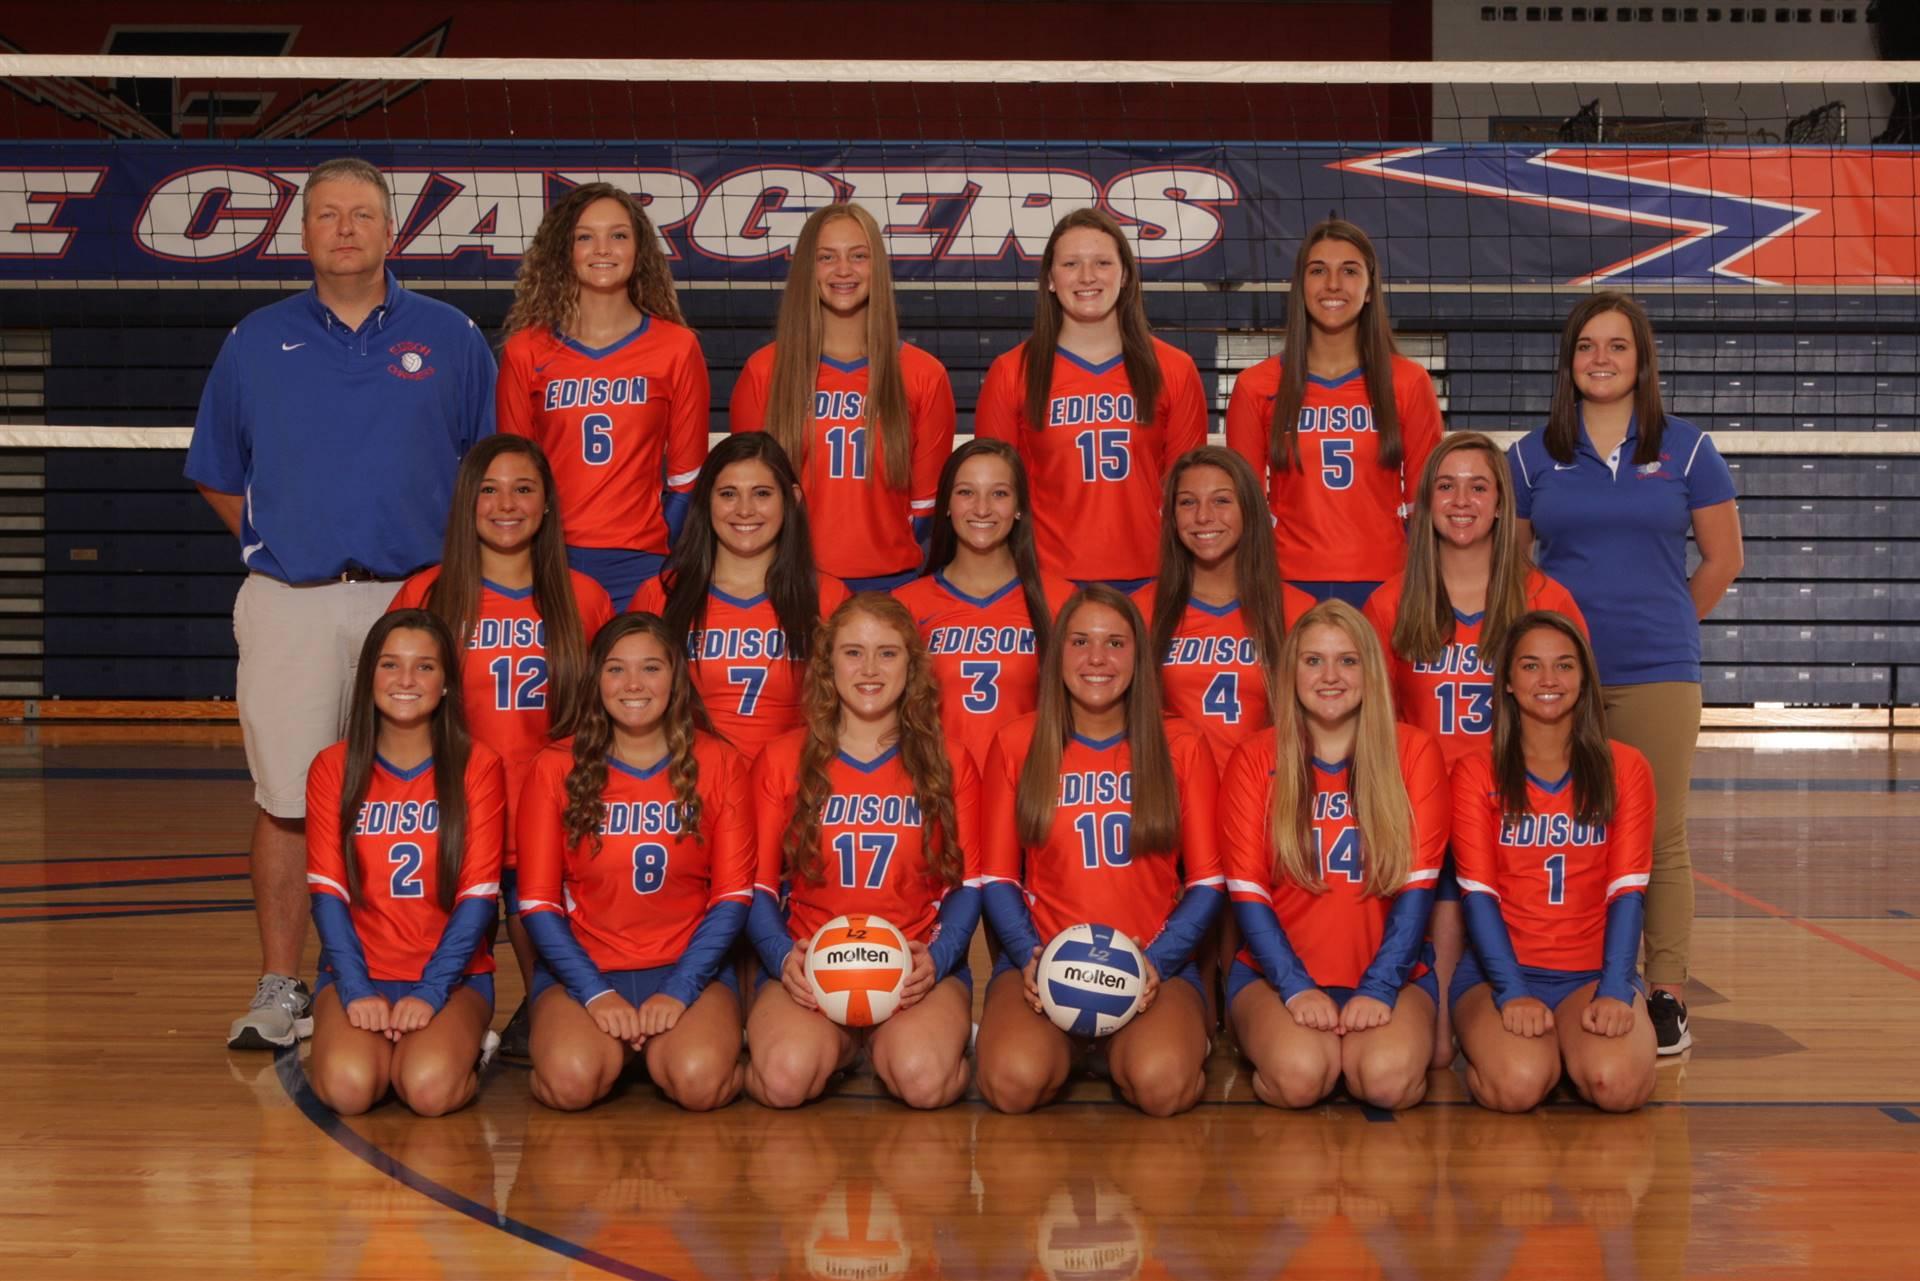 2019 Volleyball Photos